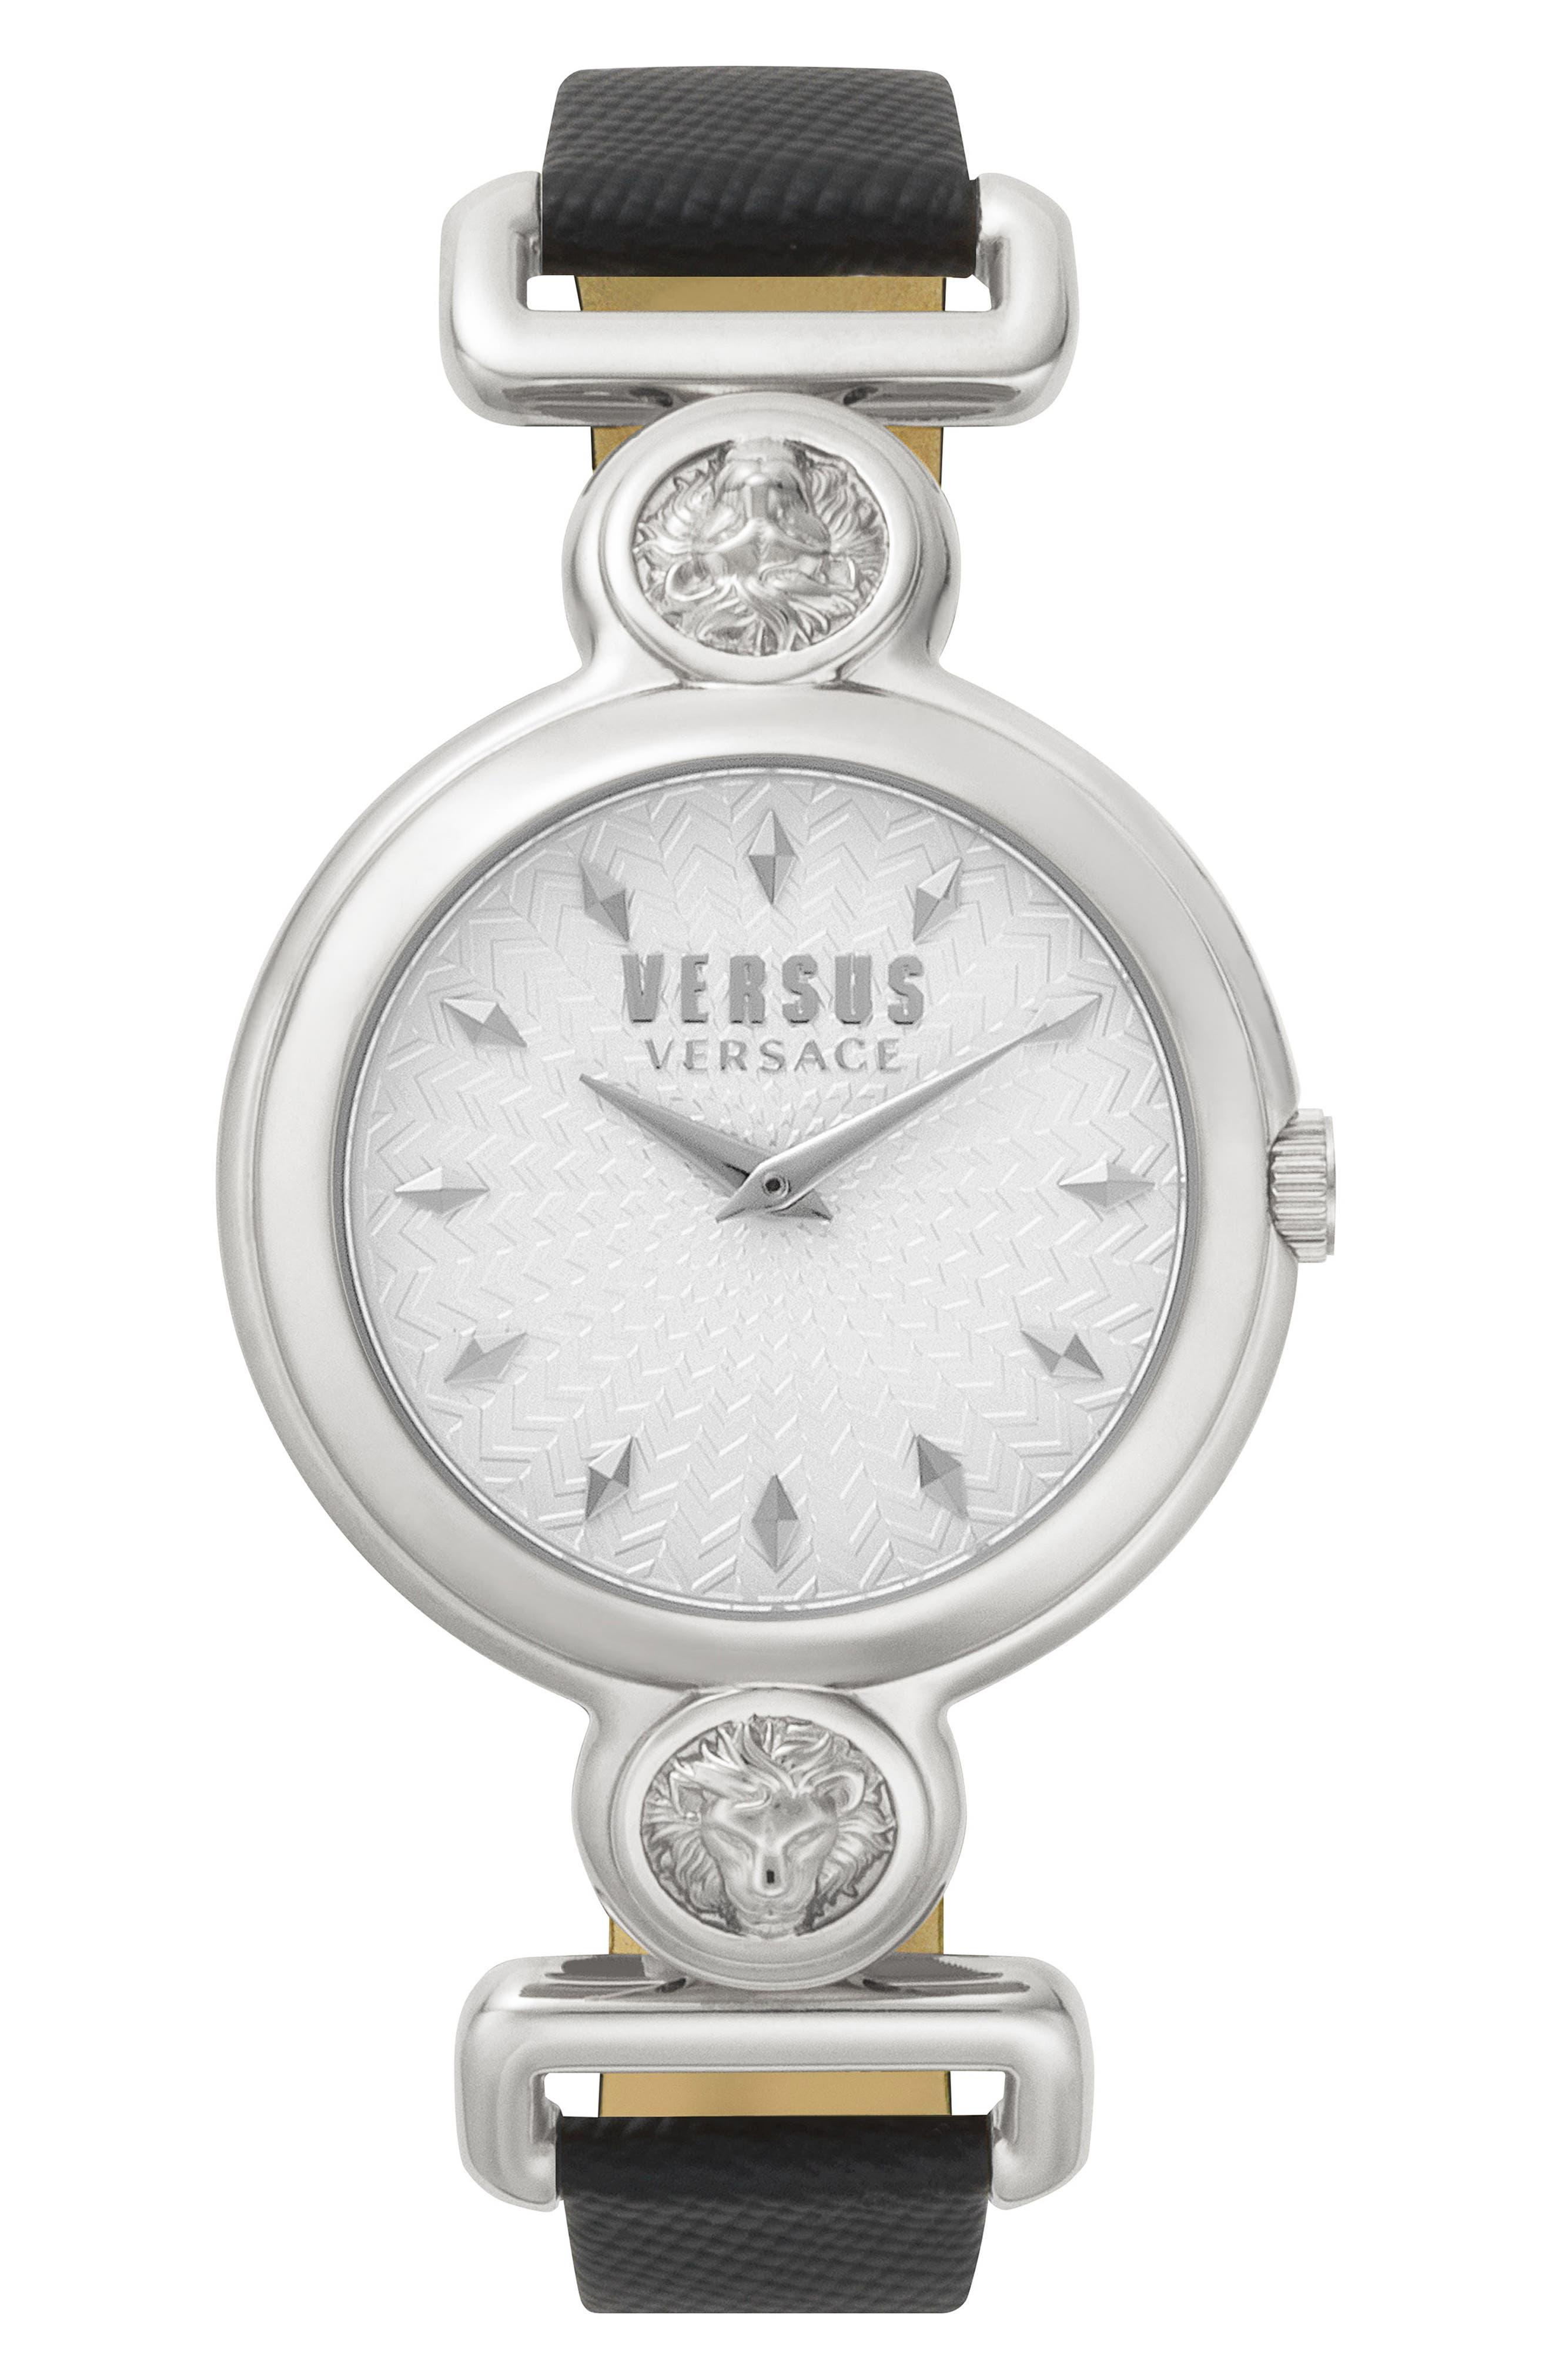 VERSUS VERSACE Sunnyridge Leather Strap Watch, 34mm, Main, color, 001